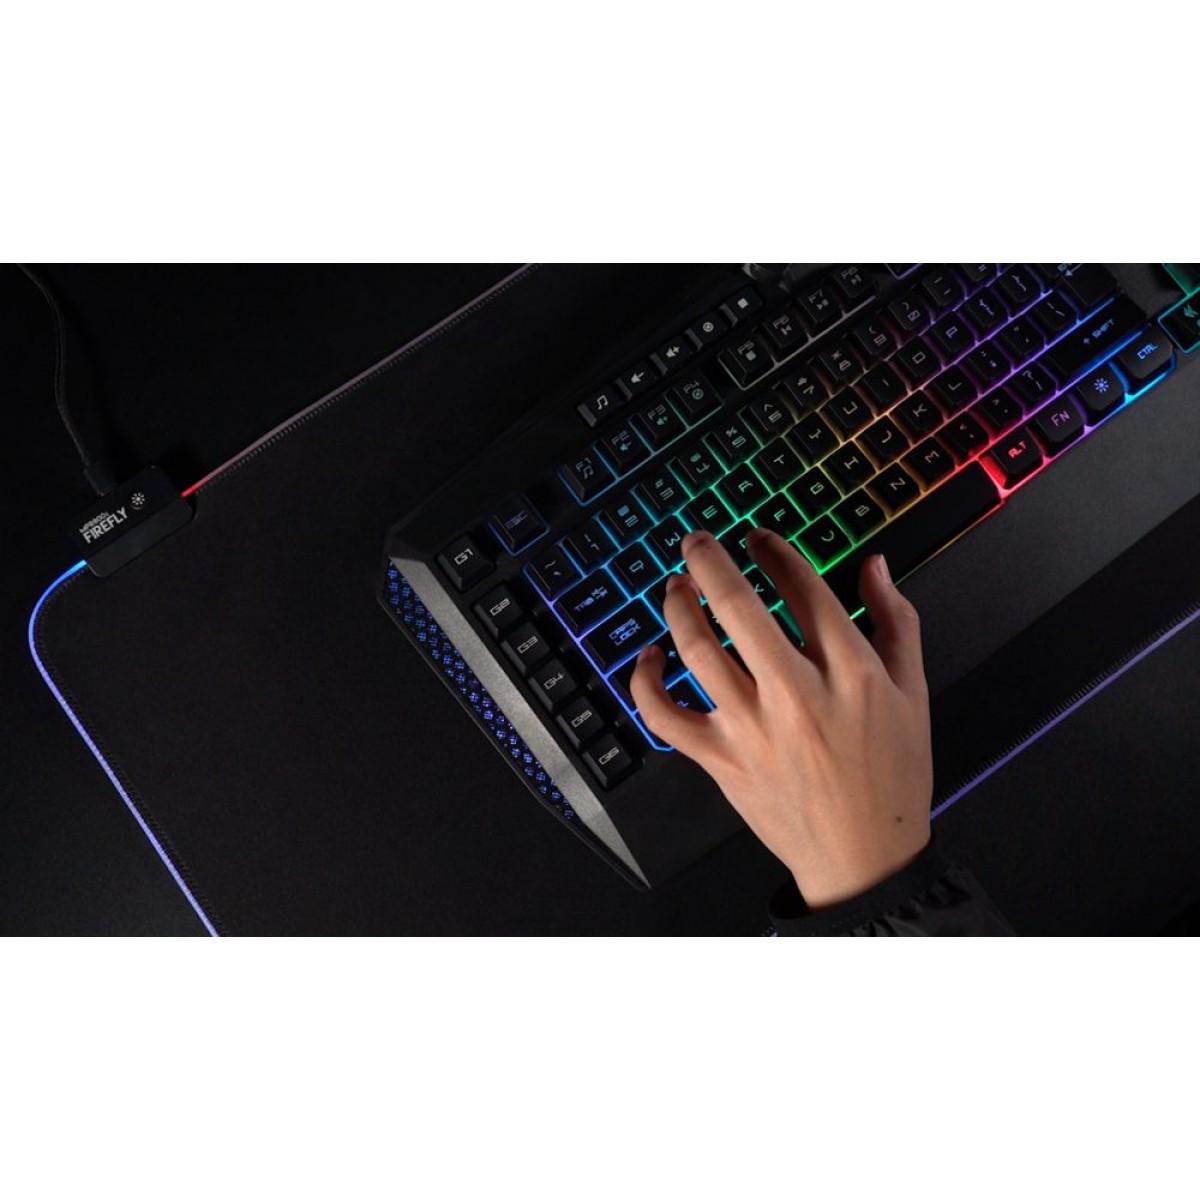 Teclado Gamer Fantech Booster, RGB, Black, K513